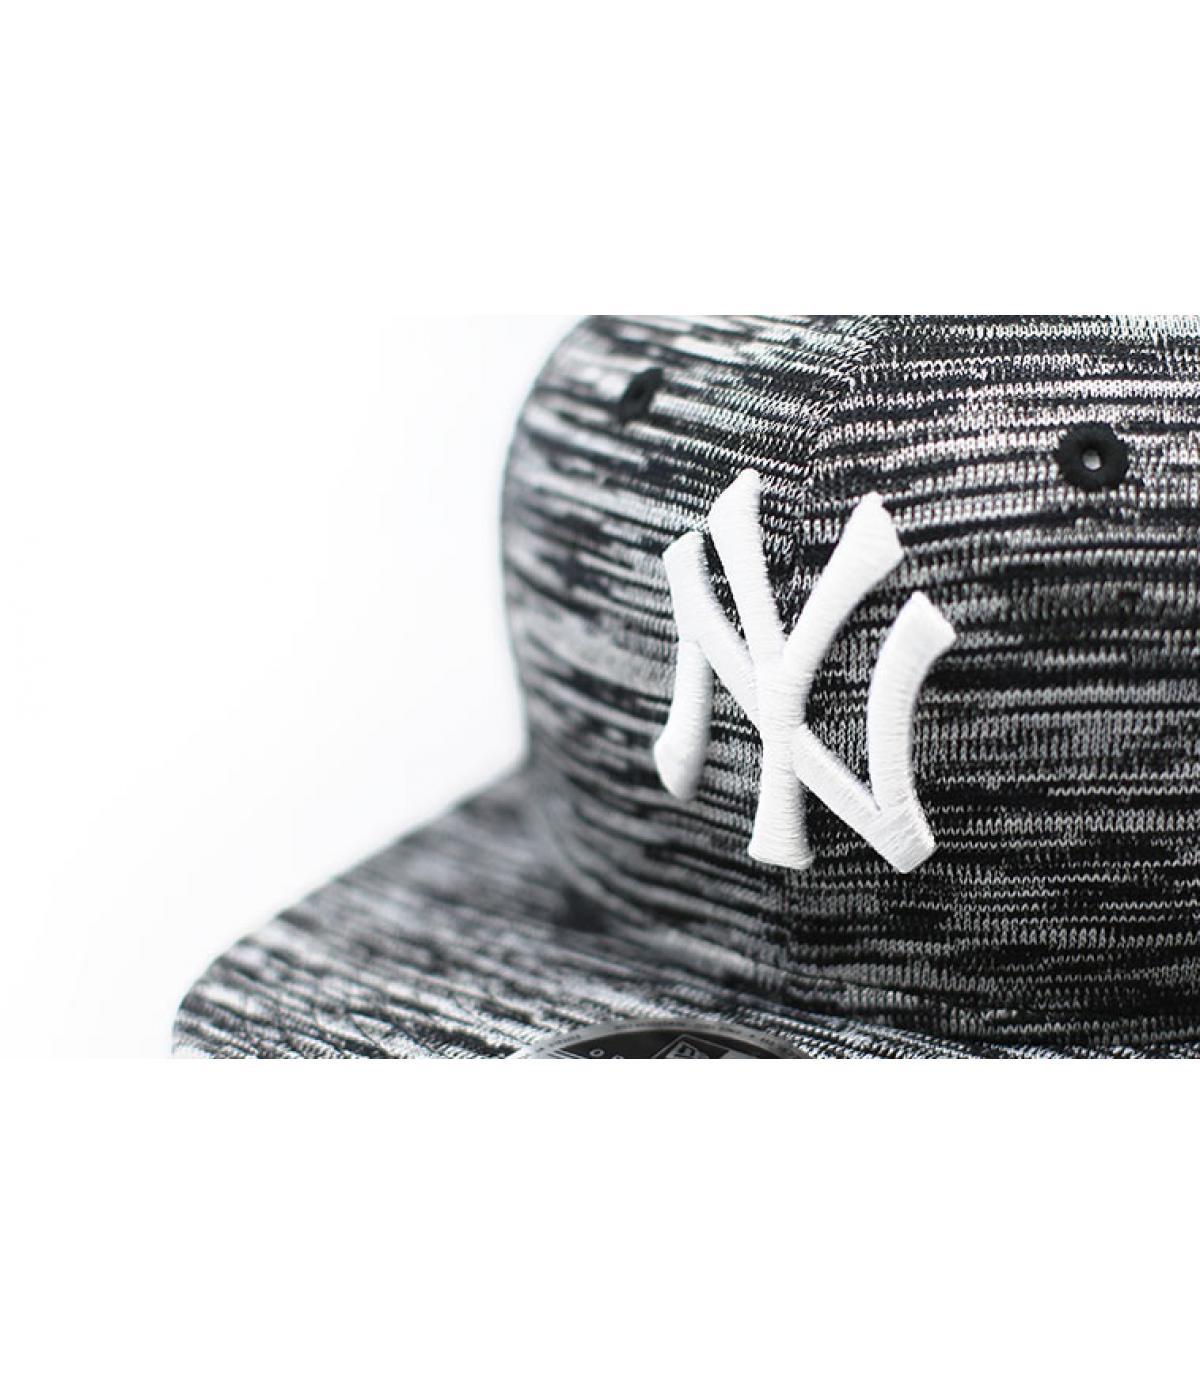 Dettagli Enginnered Fit NY 9Fifty black - image 3